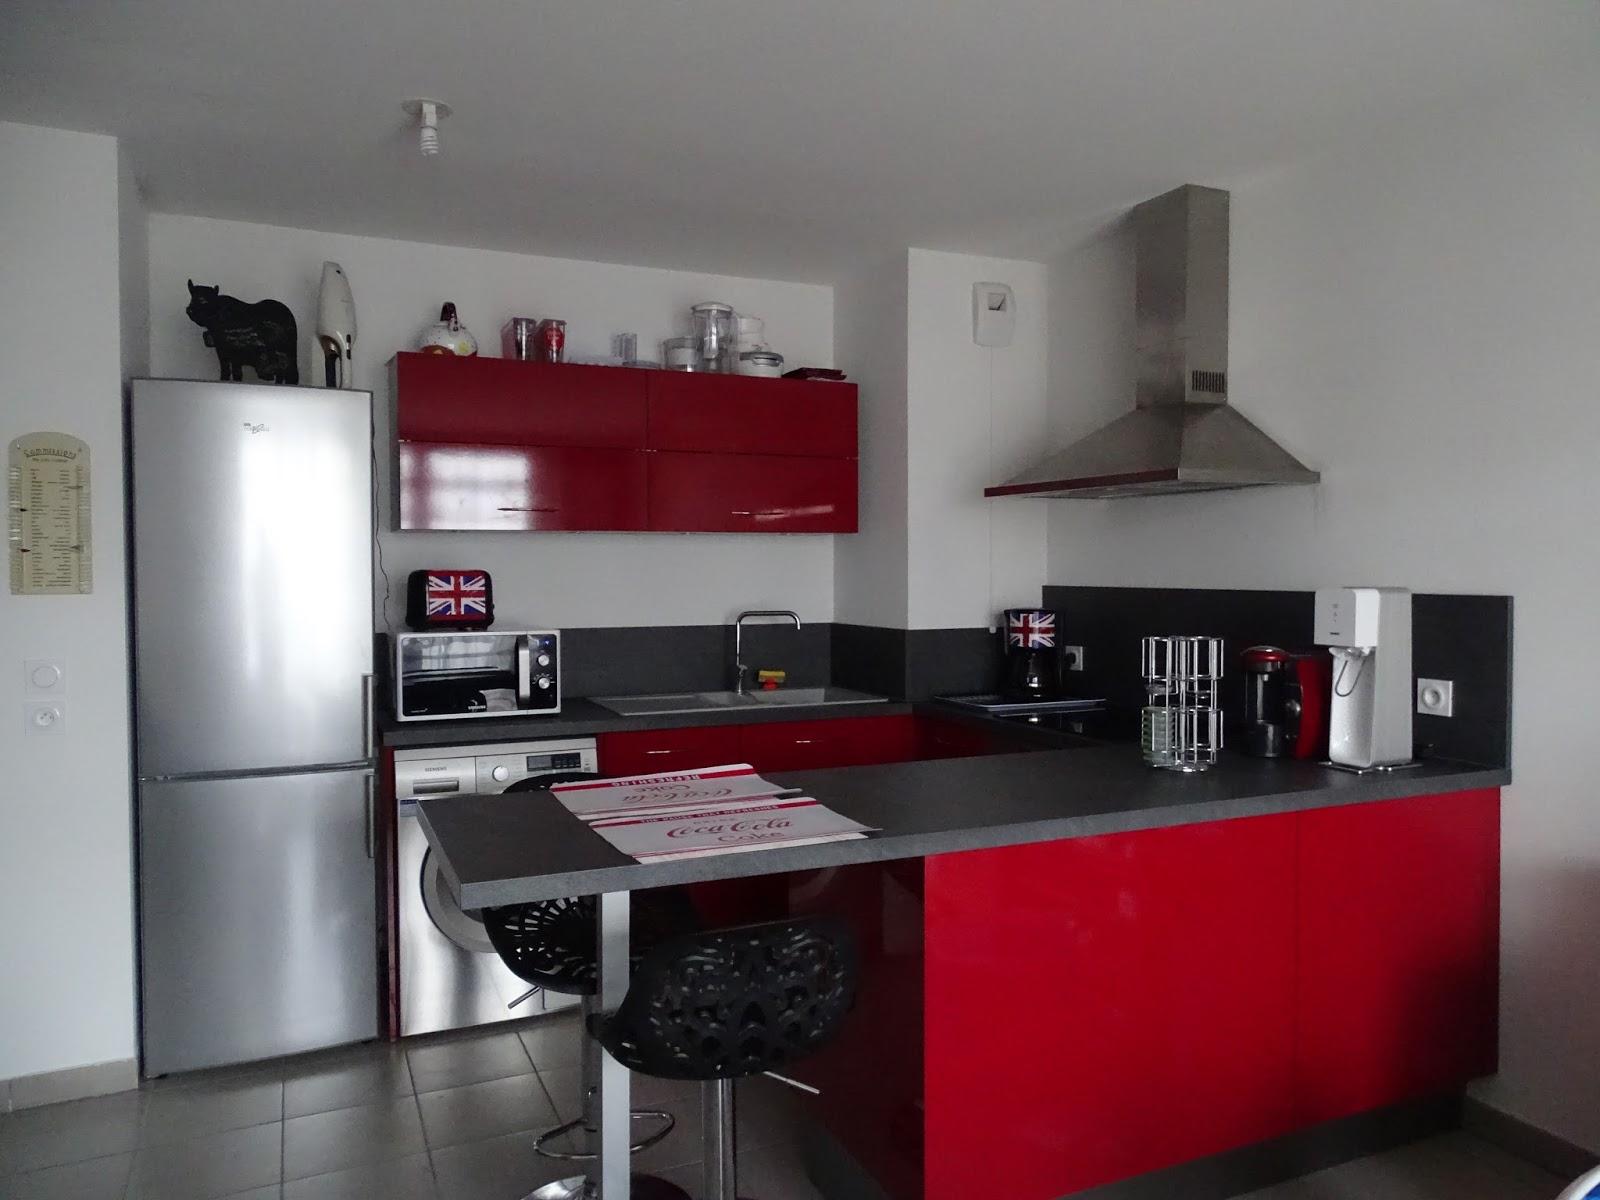 Cuisine Rouge Brillant votre cuisine mobalpa par virginie: cuisine mobalpa kiffa rouge